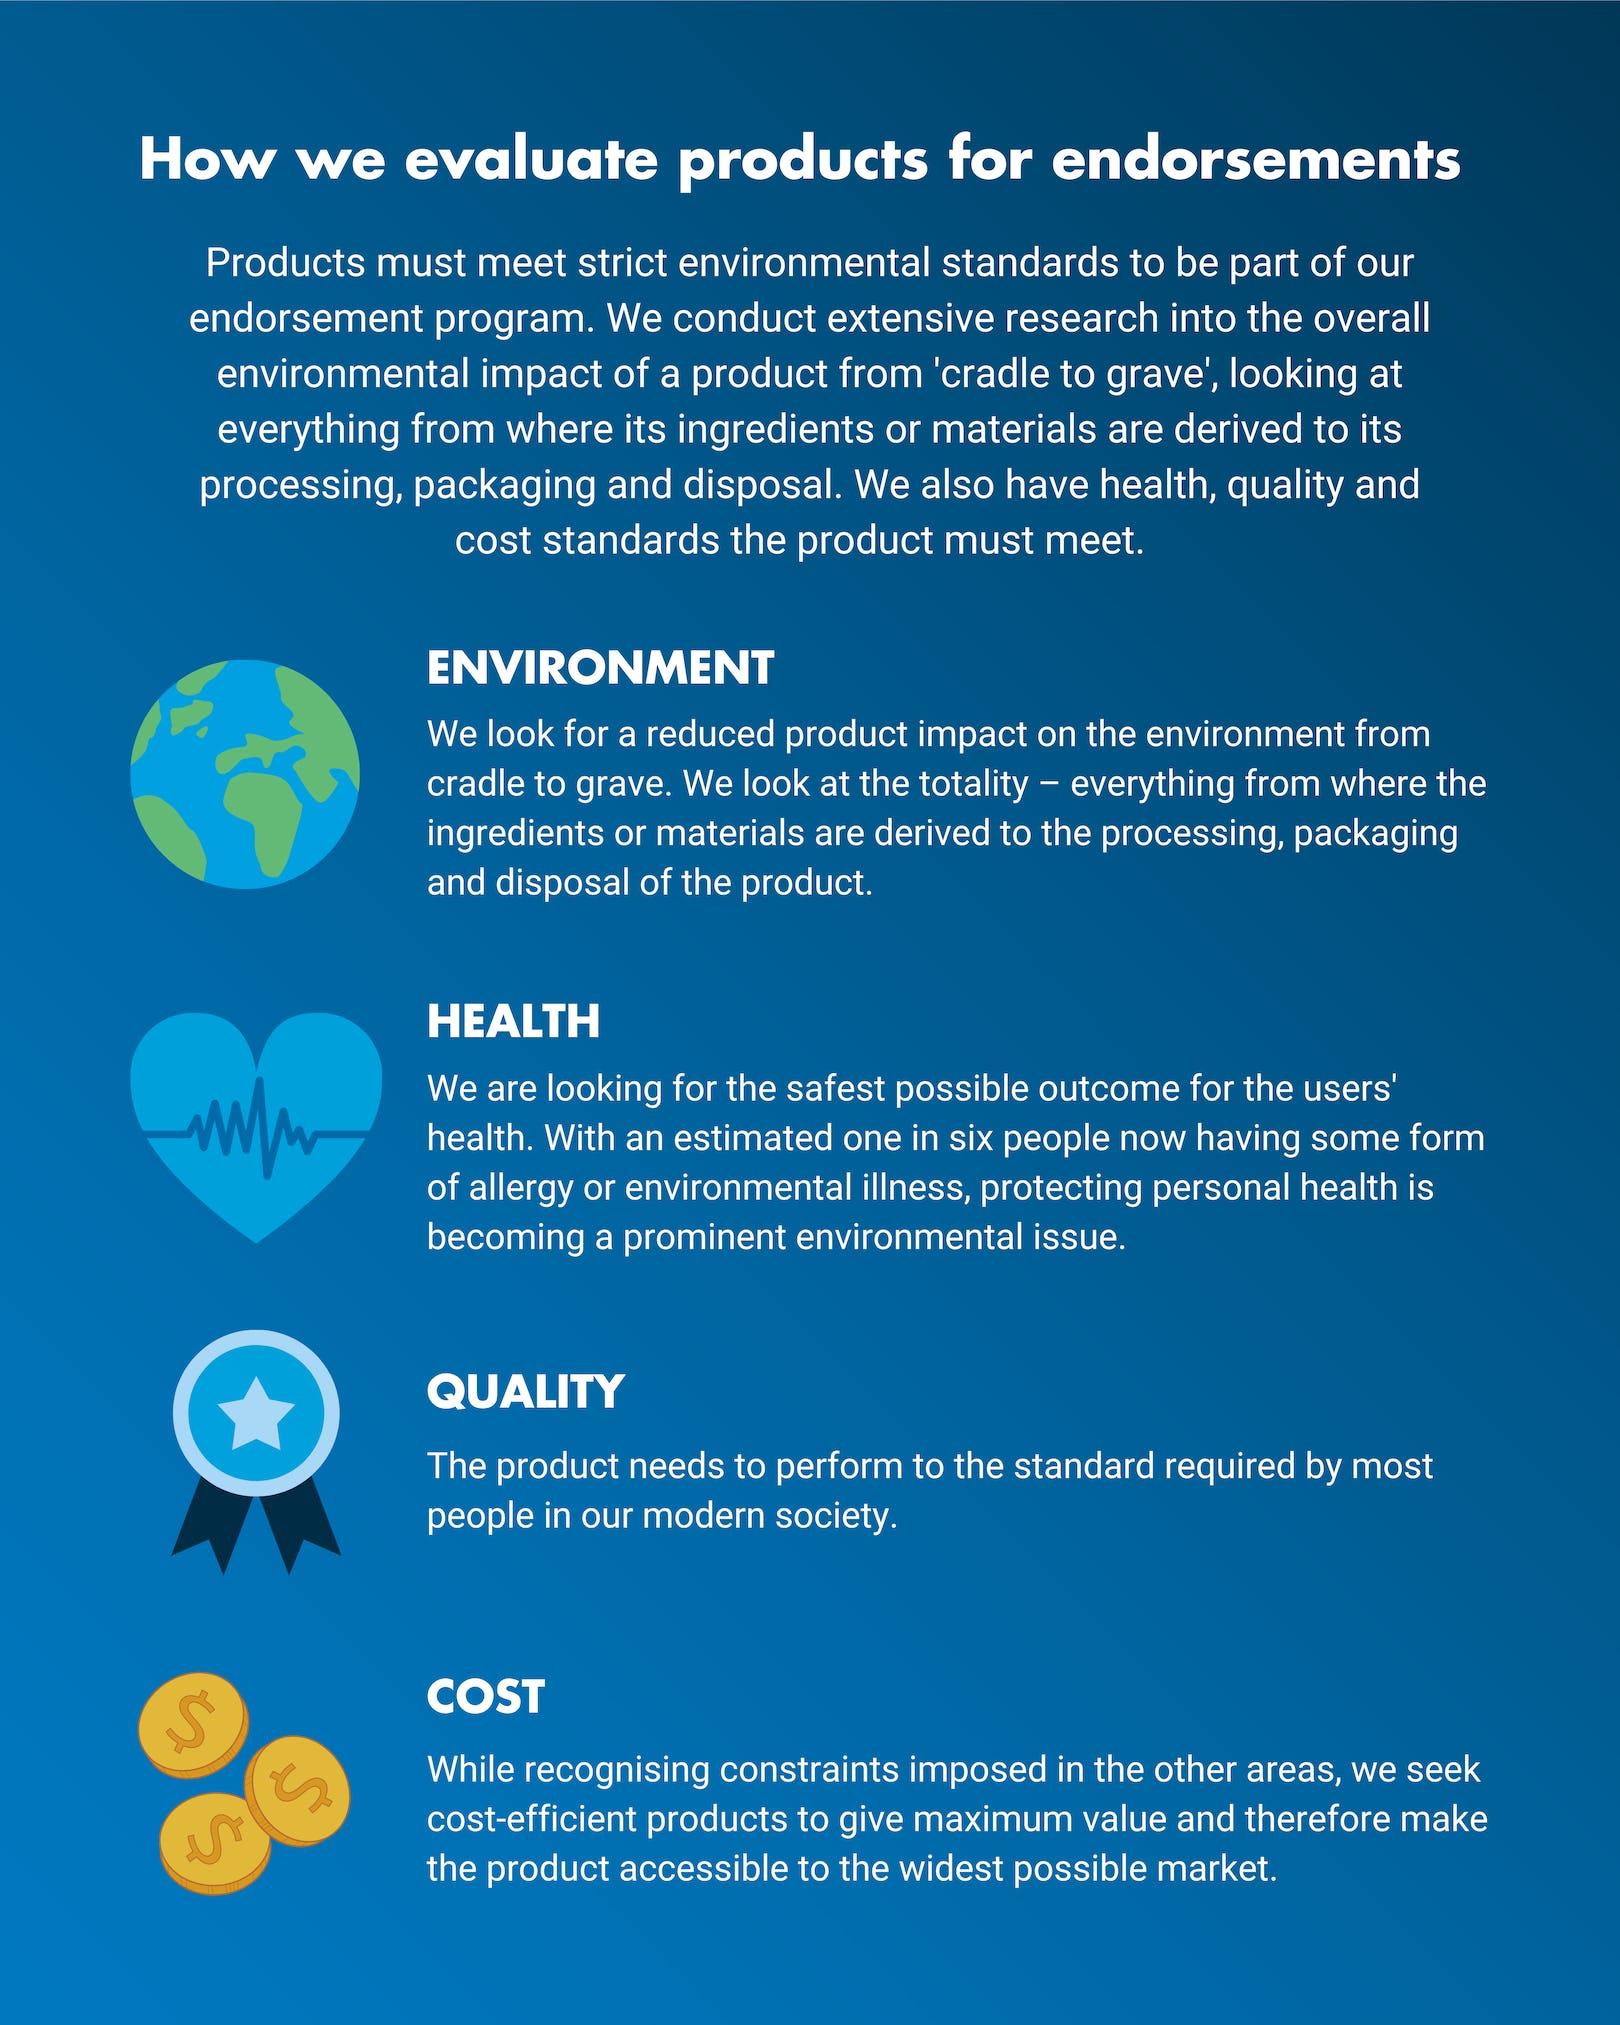 Product Endorsement evaluation infographic